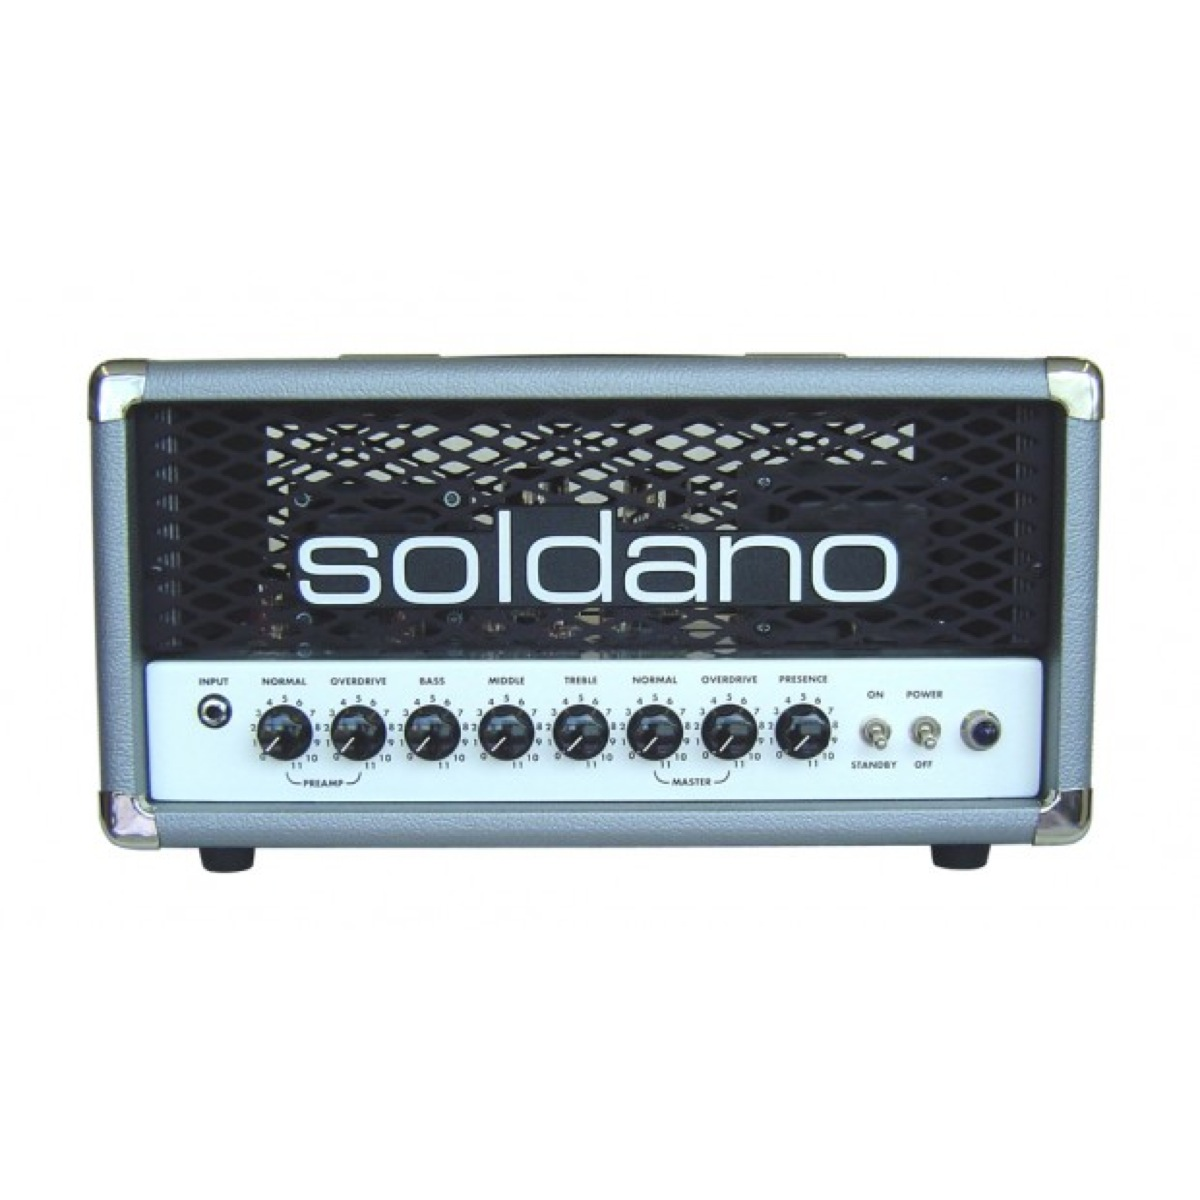 Soldano Hot Rod 25 Tube Guitar Amp Head